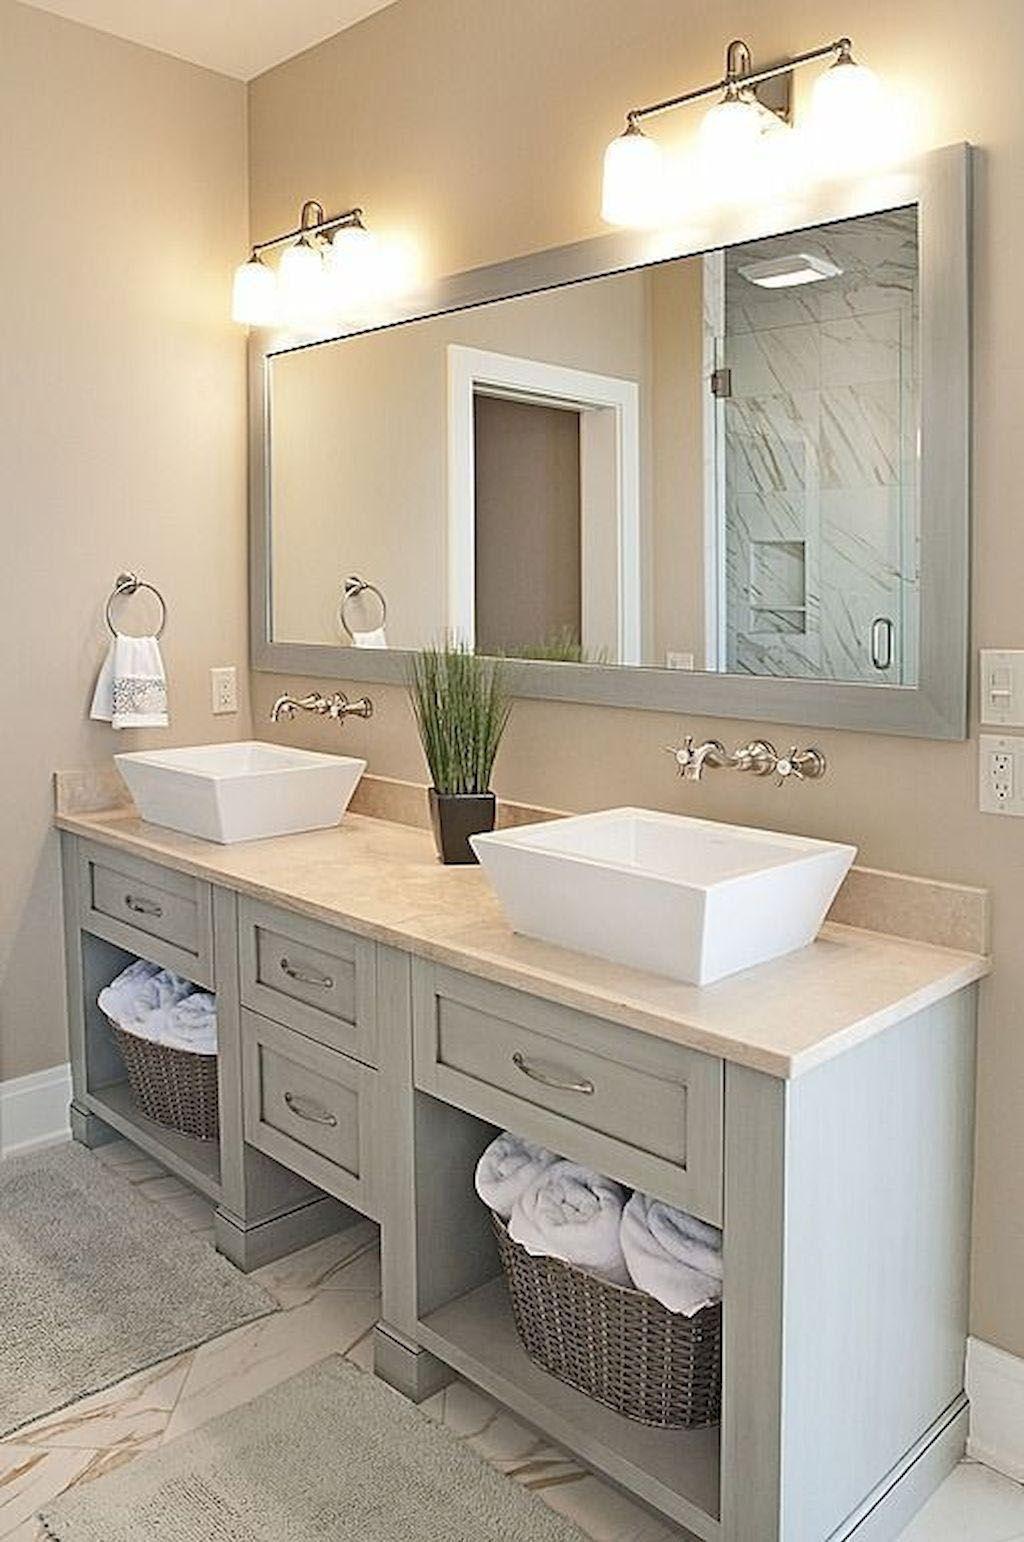 Fantastic Victorian Bathroom Mirror Ideas One And Only Dandjhome Com Bathroom Mirror Design Large Bathroom Mirrors Vanity Sink